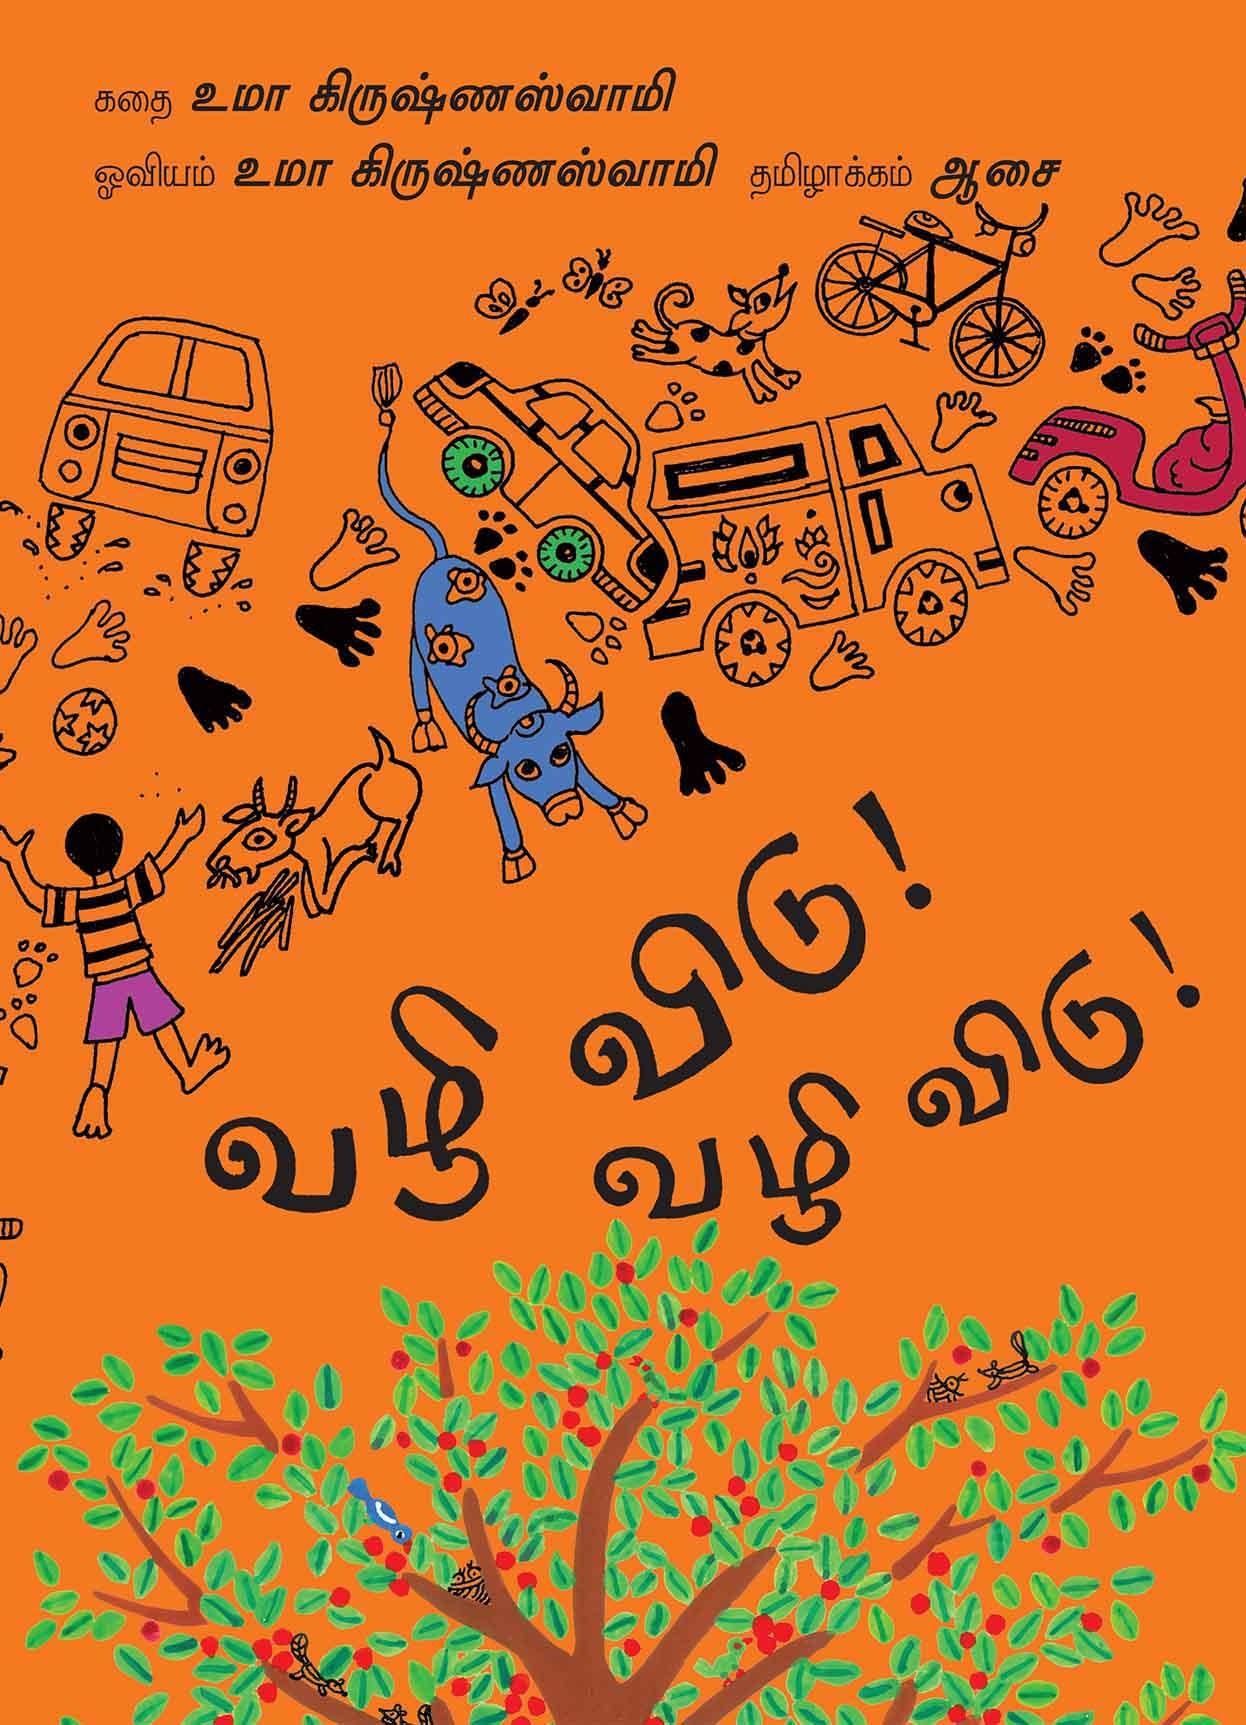 Out Of The Way! Out Of The Way!/Vazhi Vidu! Vazhi Vidu! (Tamil)